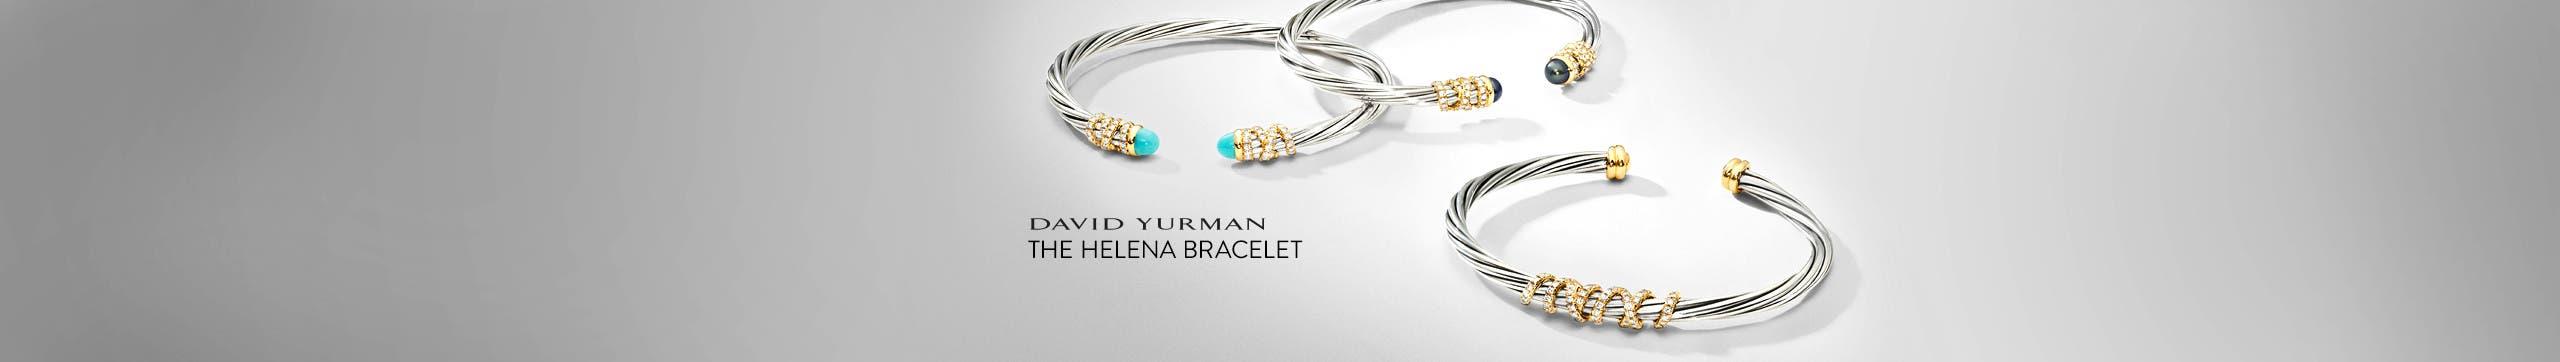 David Yurman: the Helena bracelet.